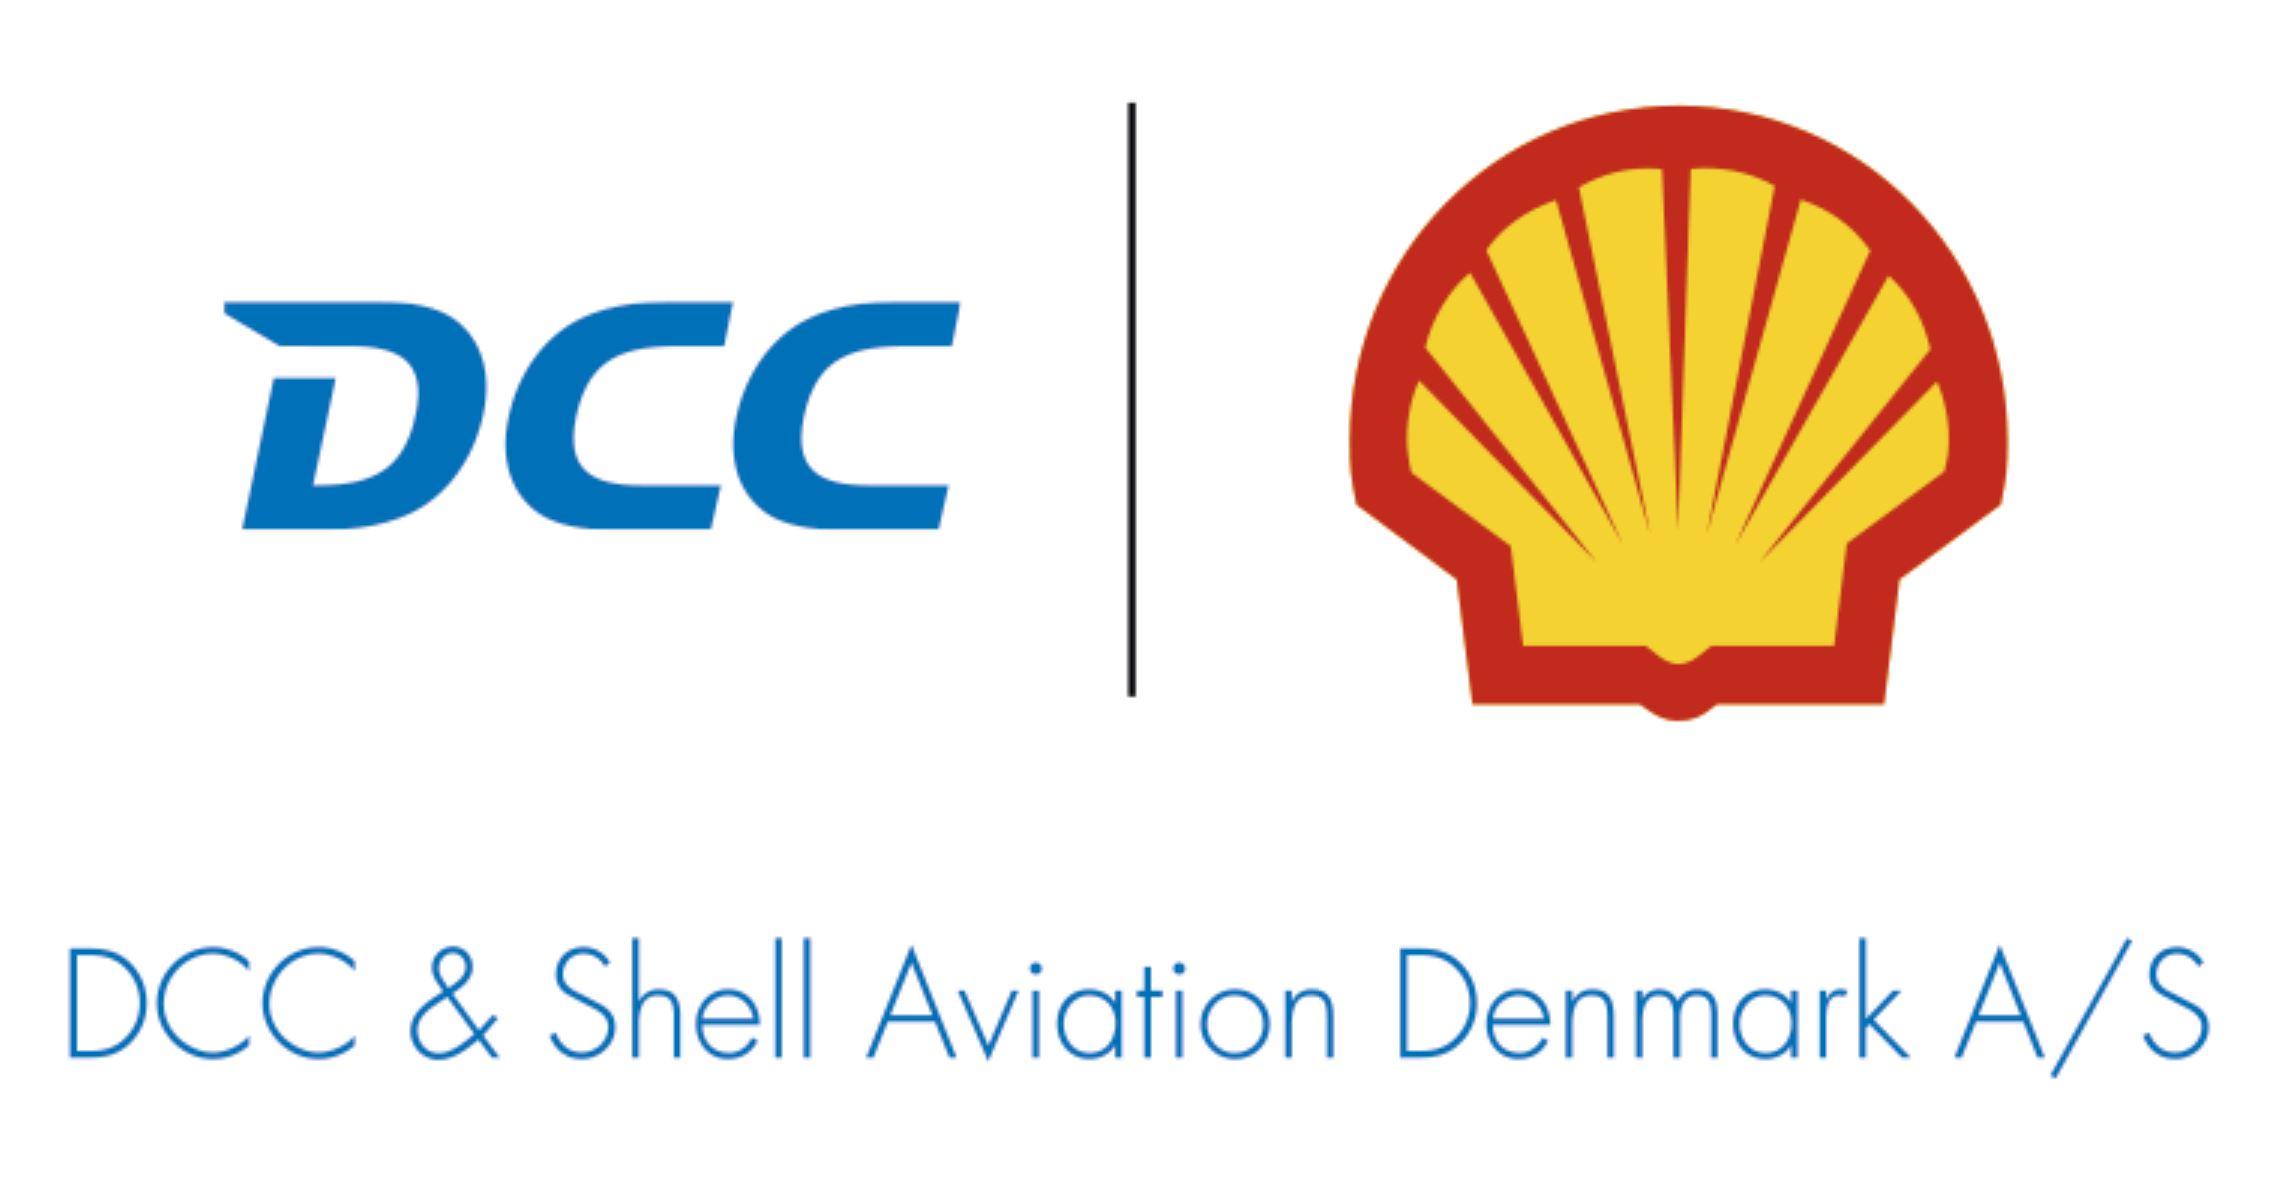 DCC & Shell Aviation Denmark A/S